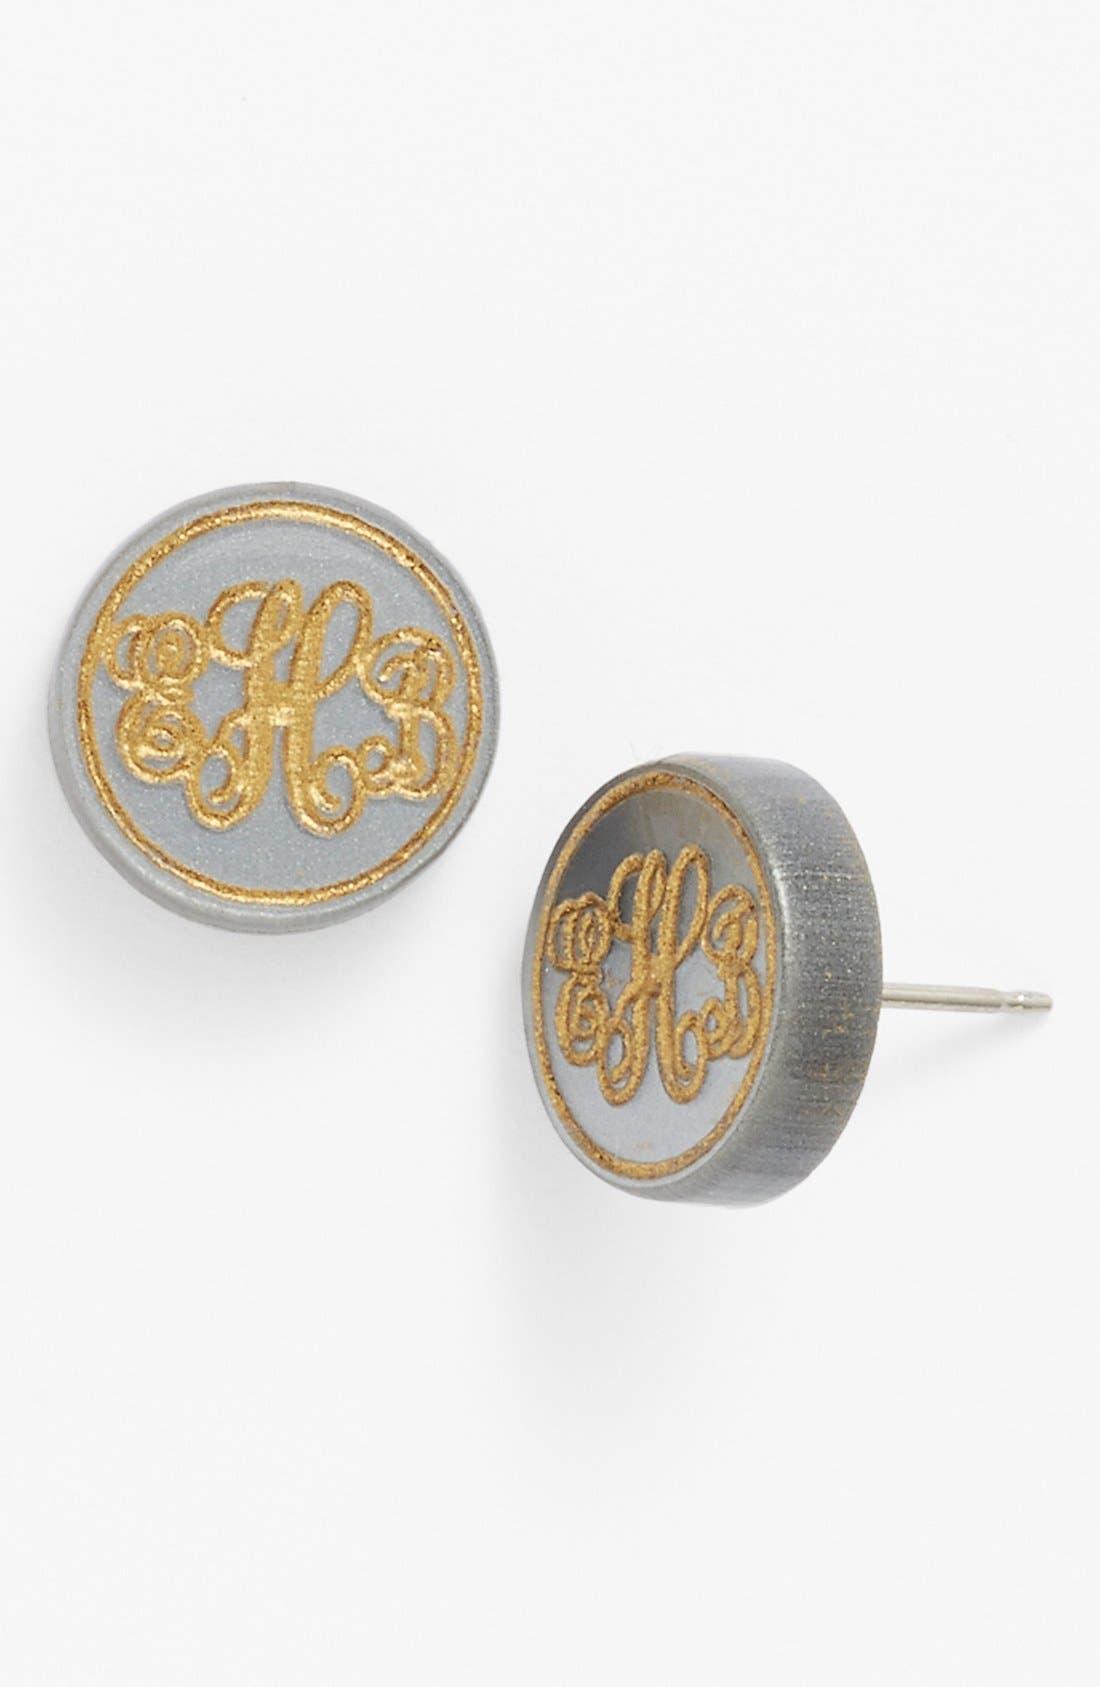 'Chelsea' Small Personalized Monogram Stud Earrings,                         Main,                         color, Gunmetal/ Gold